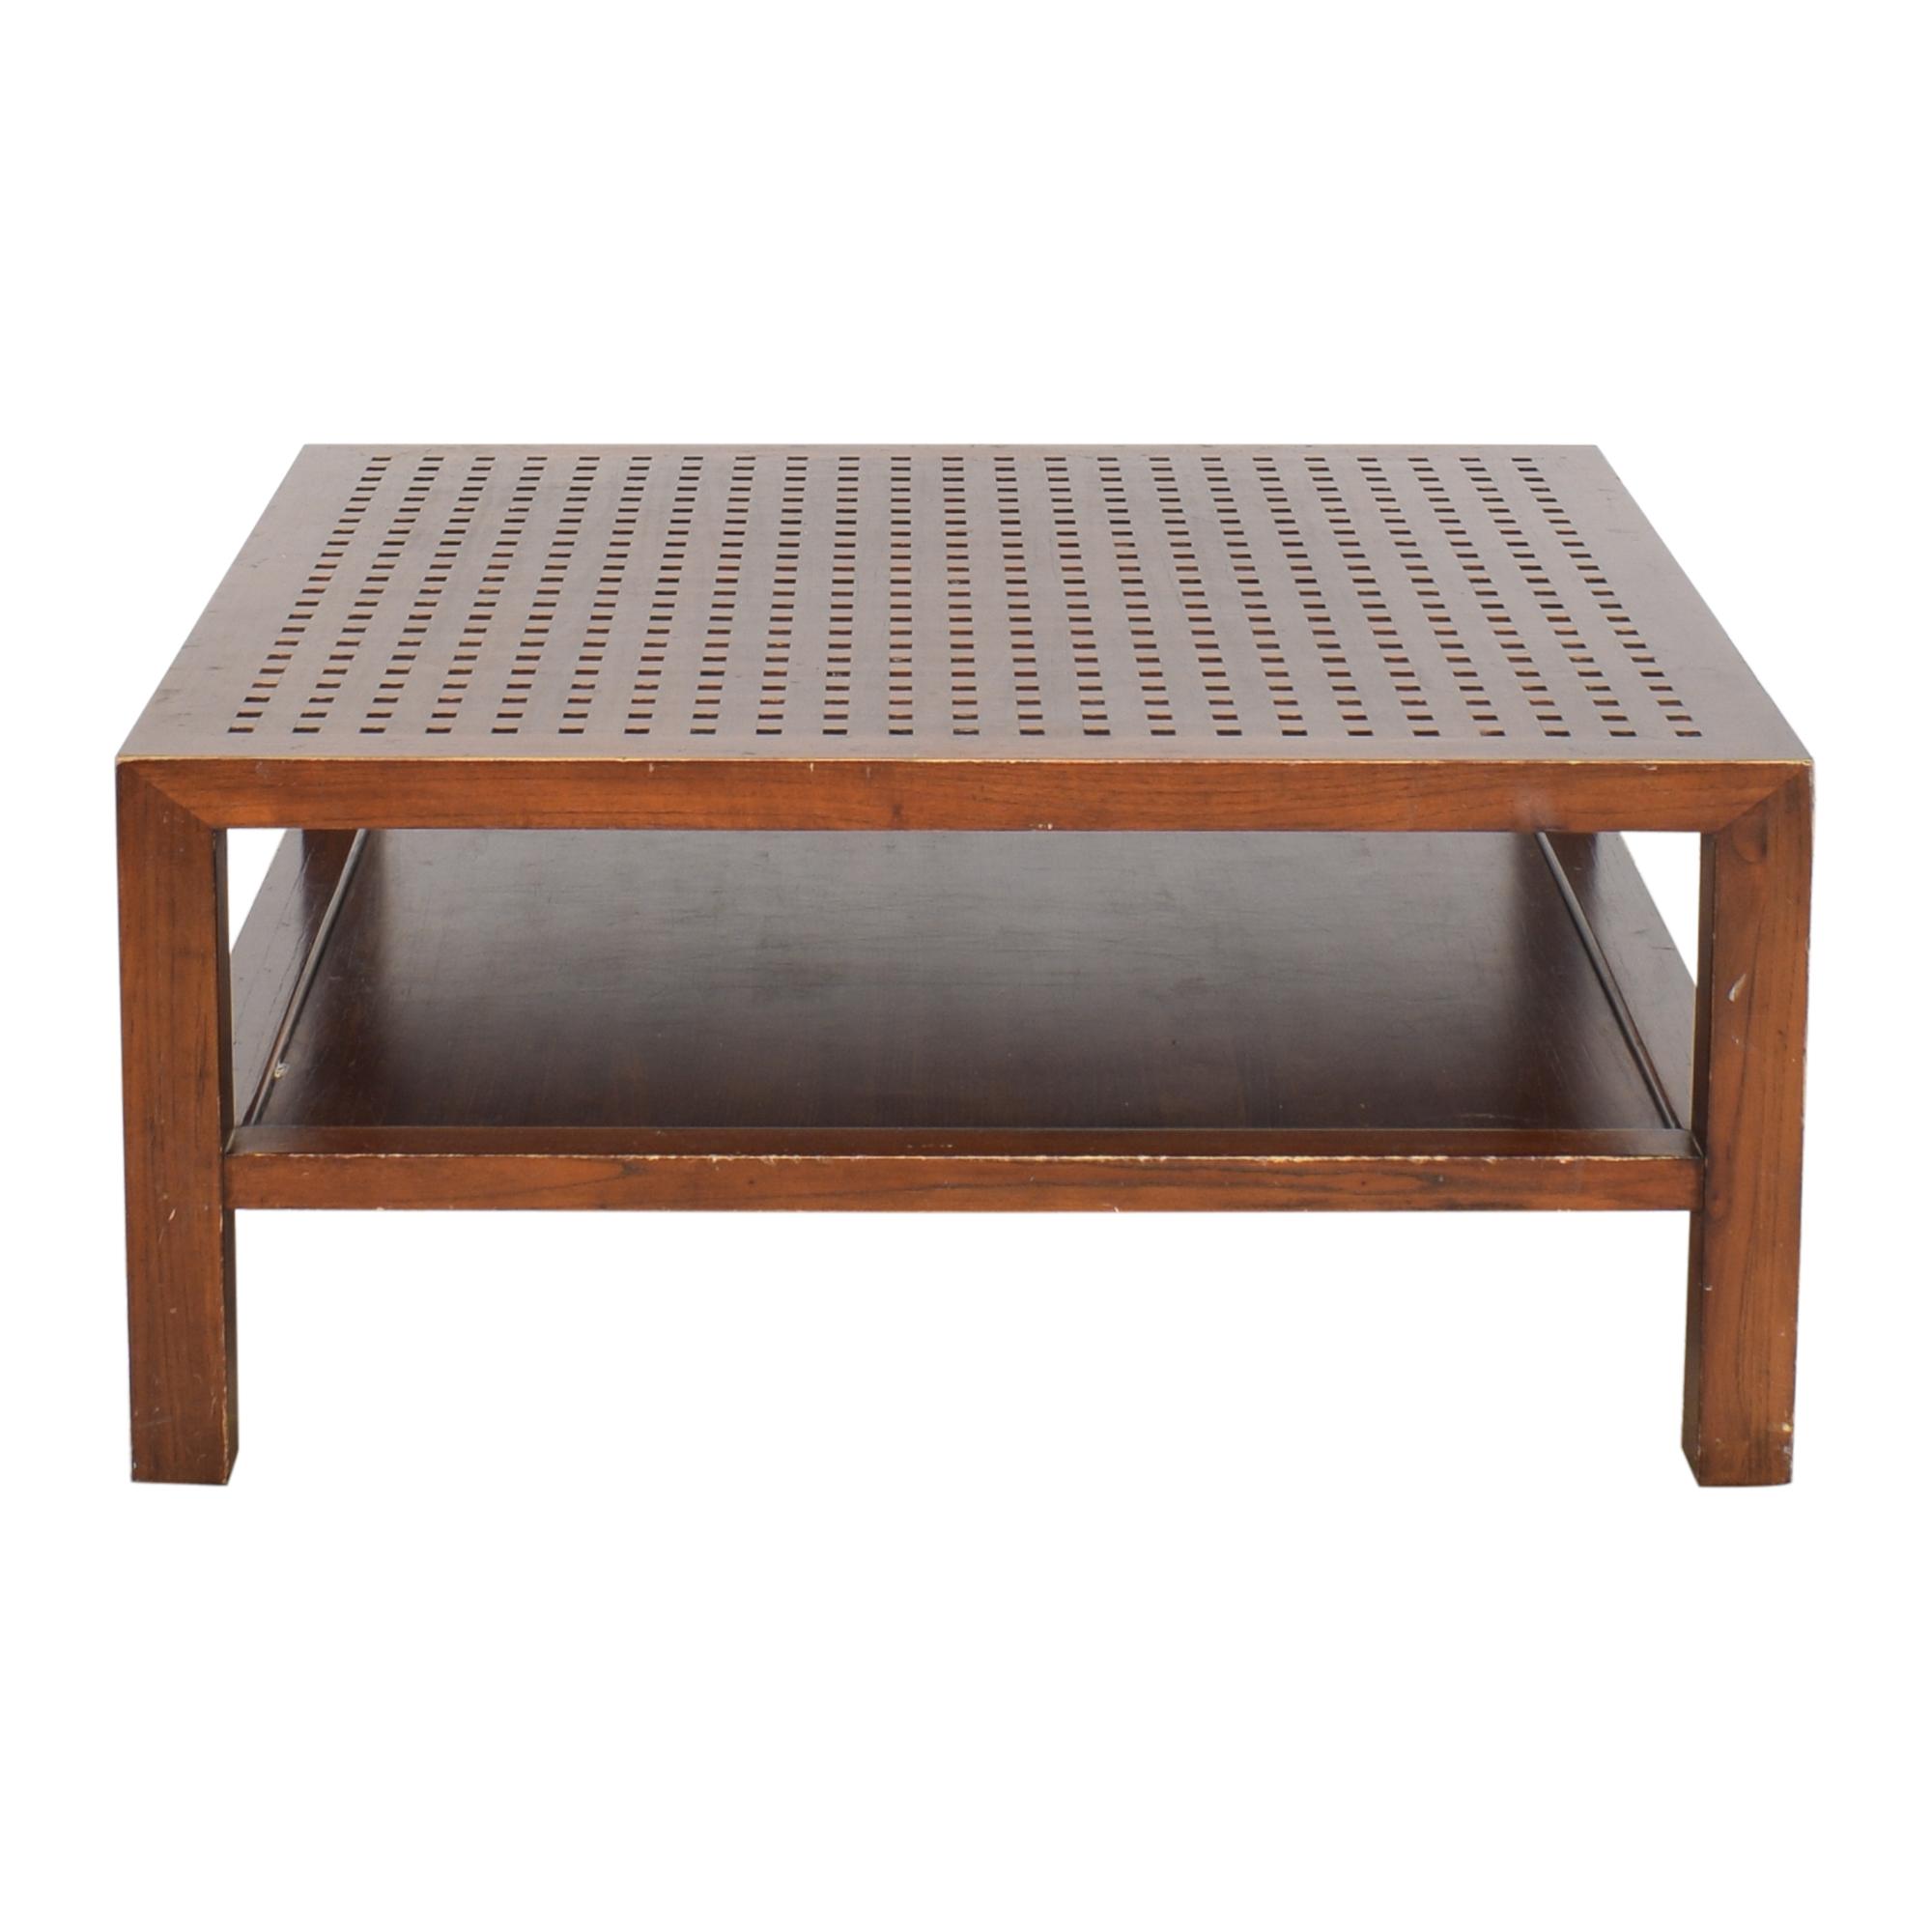 Room & Board Room & Board Maria Yee Grid Coffee Table price